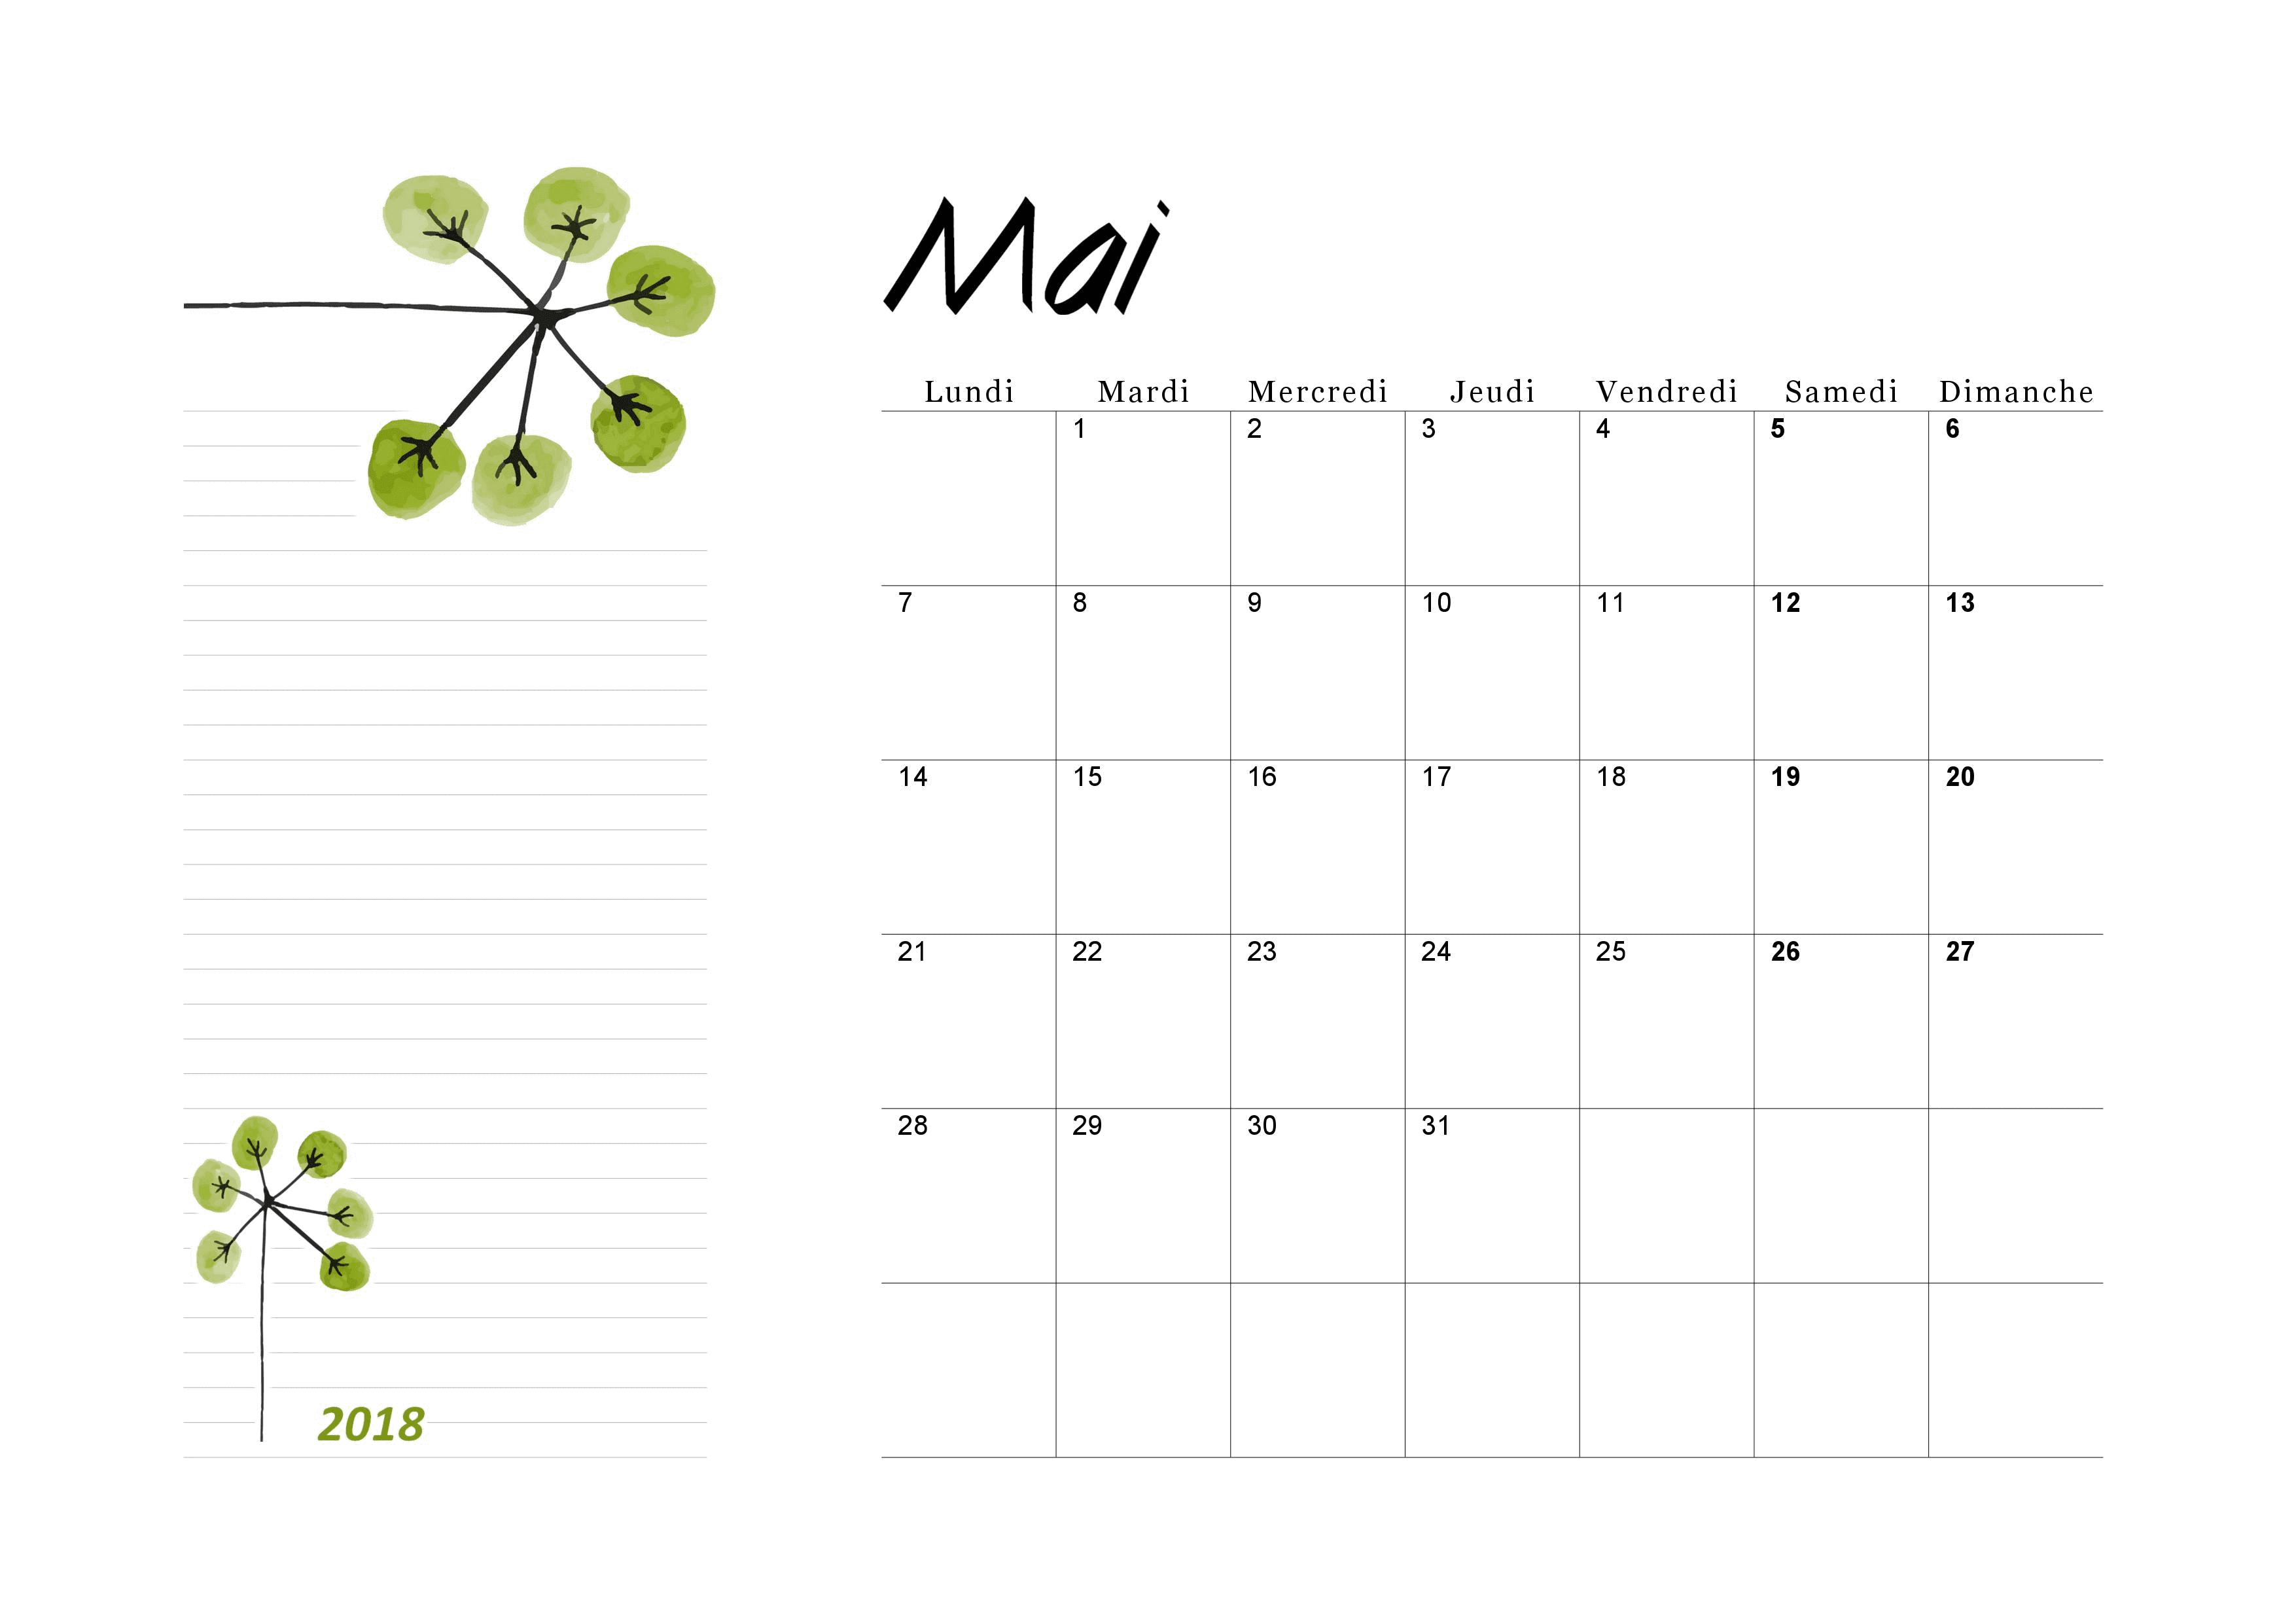 Calendrier Mai 2018 A Imprimer Calendriers Pdf Imprimables